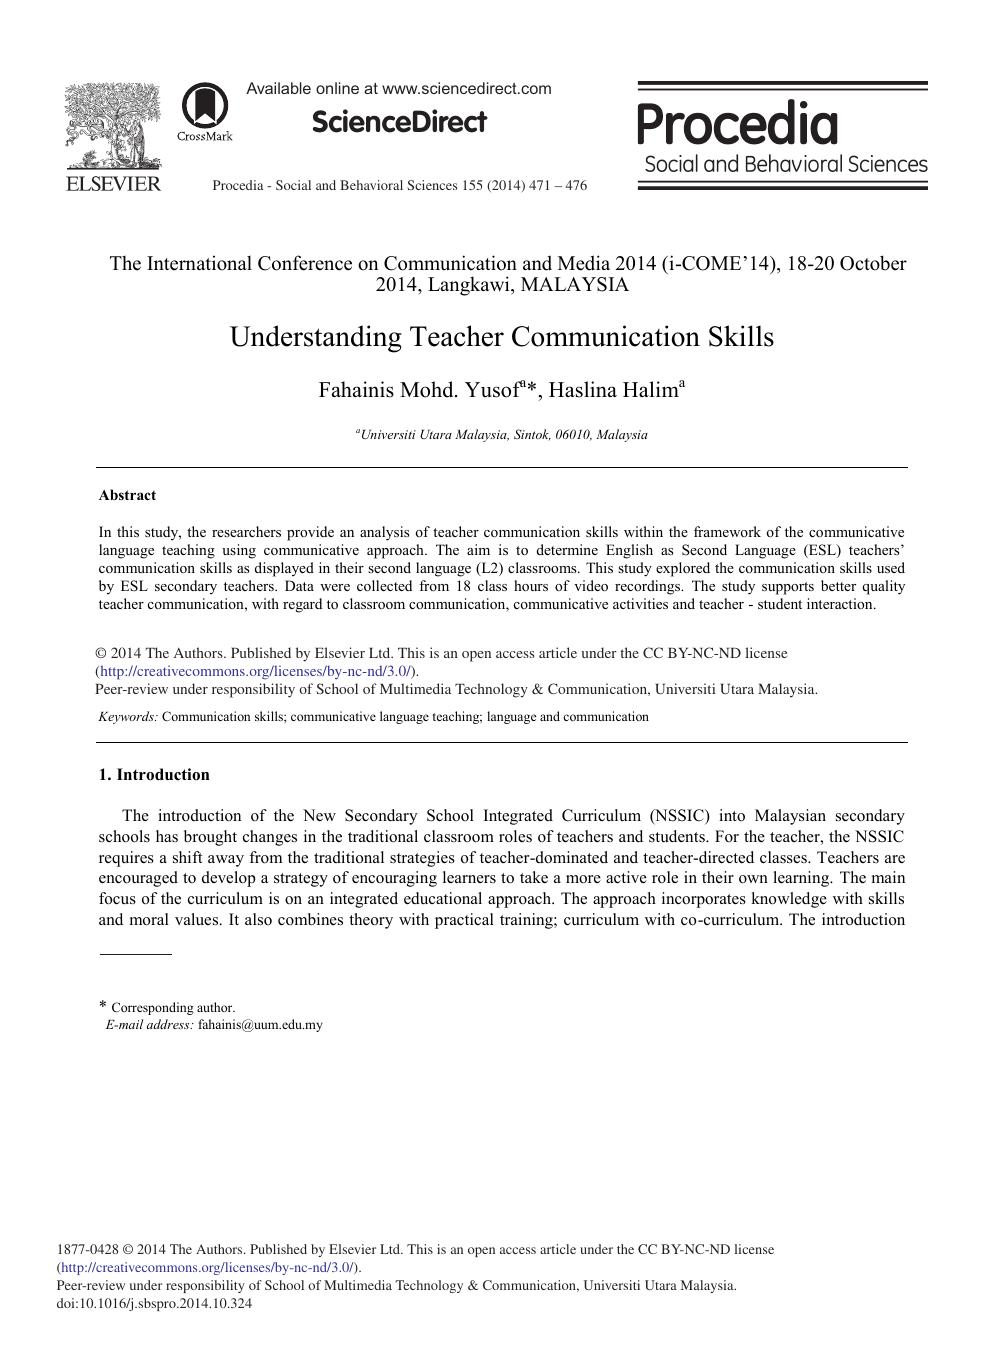 Understanding Teacher Communication Skills – topic of research paper